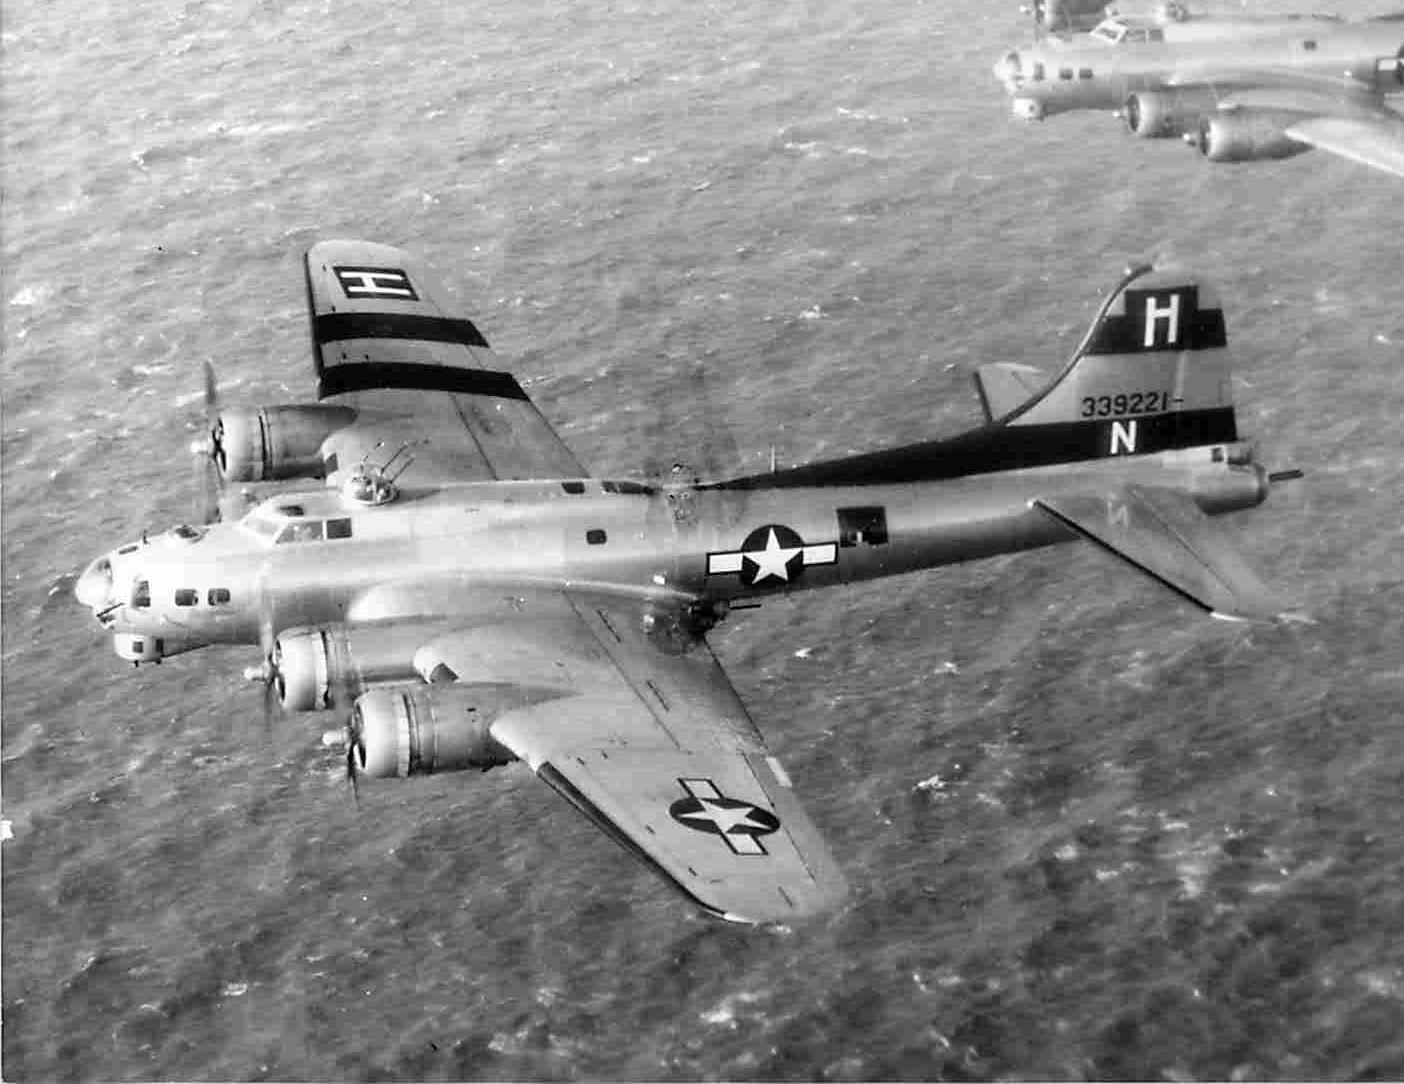 B-17 43-39221